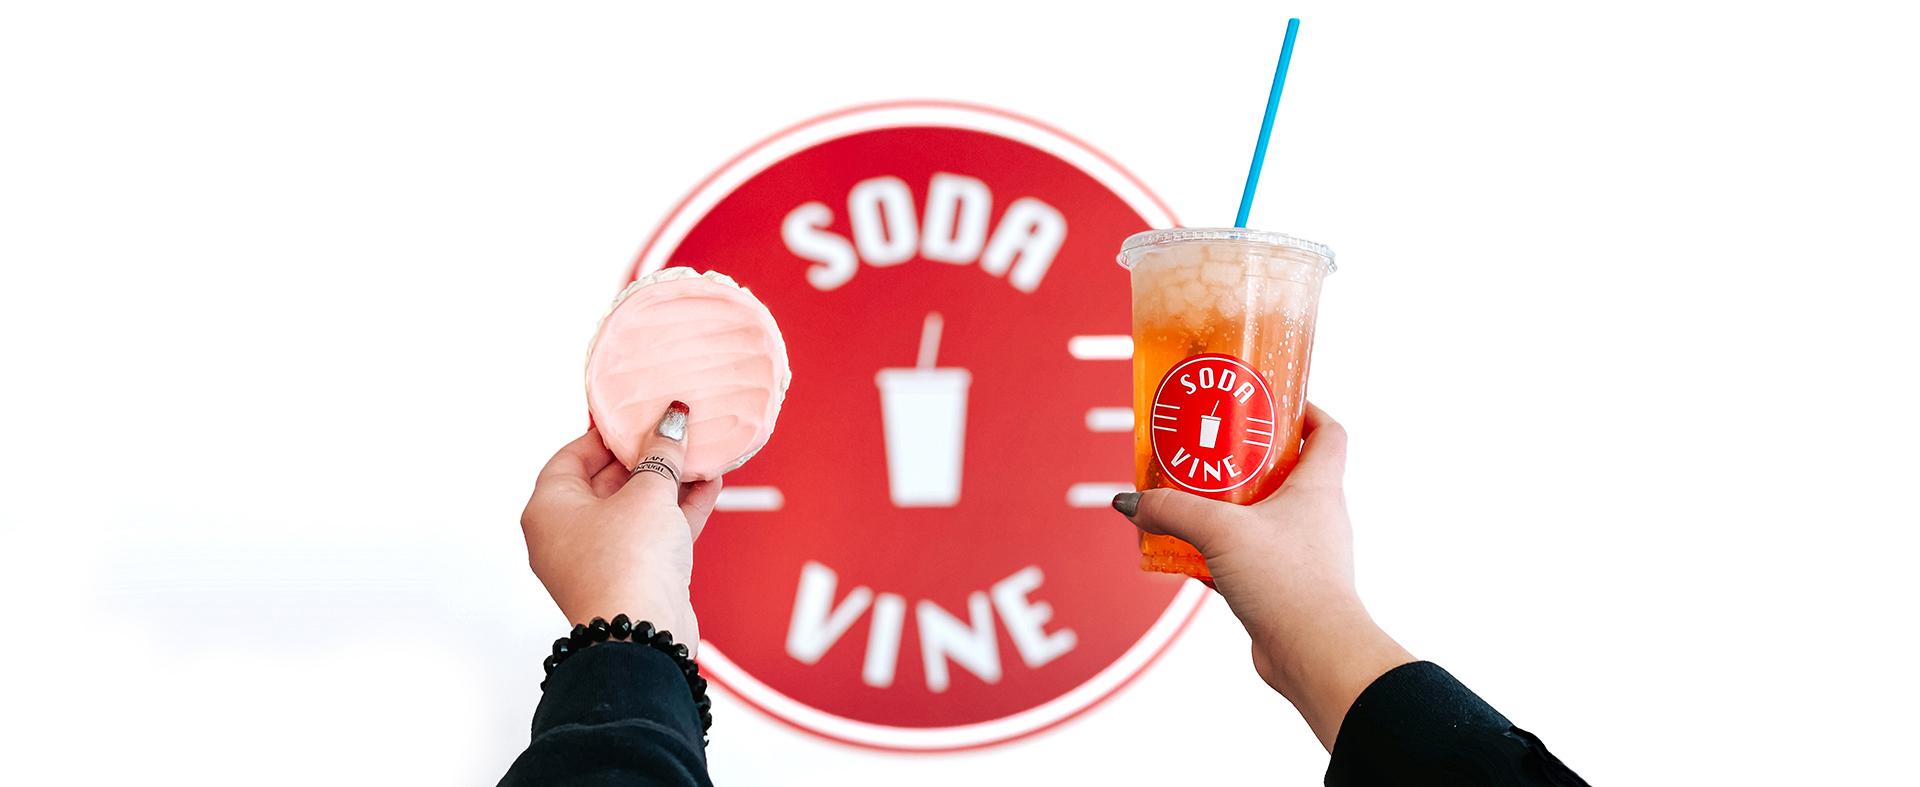 Soda-Vine-soda-and-cookies-idaho